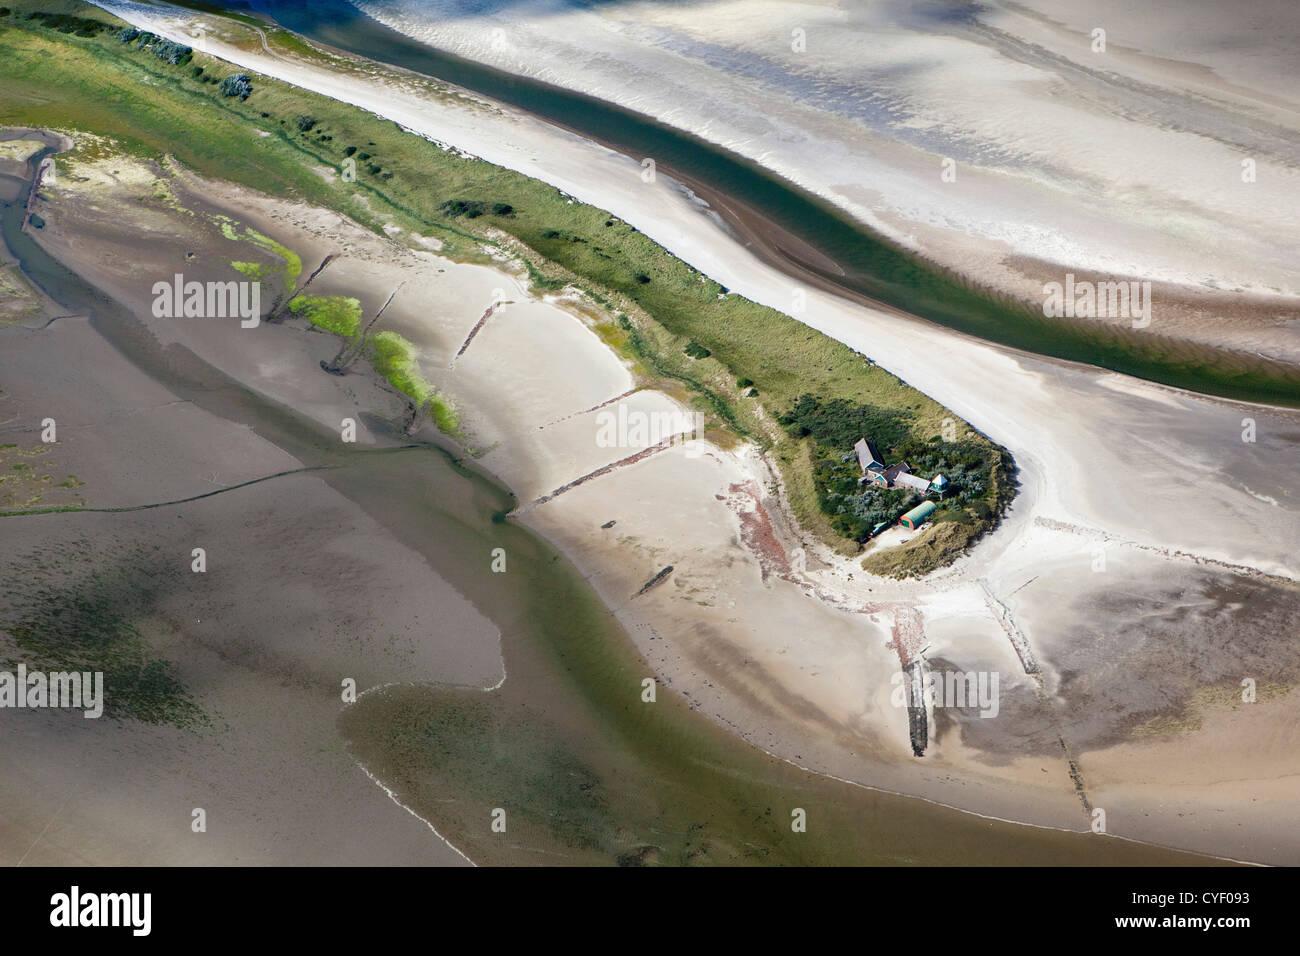 Insel namens Rottumerplaat. Teil der Wattenmeer-Inseln. UNESCO-Weltkulturerbe. Marsh Land, Watten. Luft. Stockbild